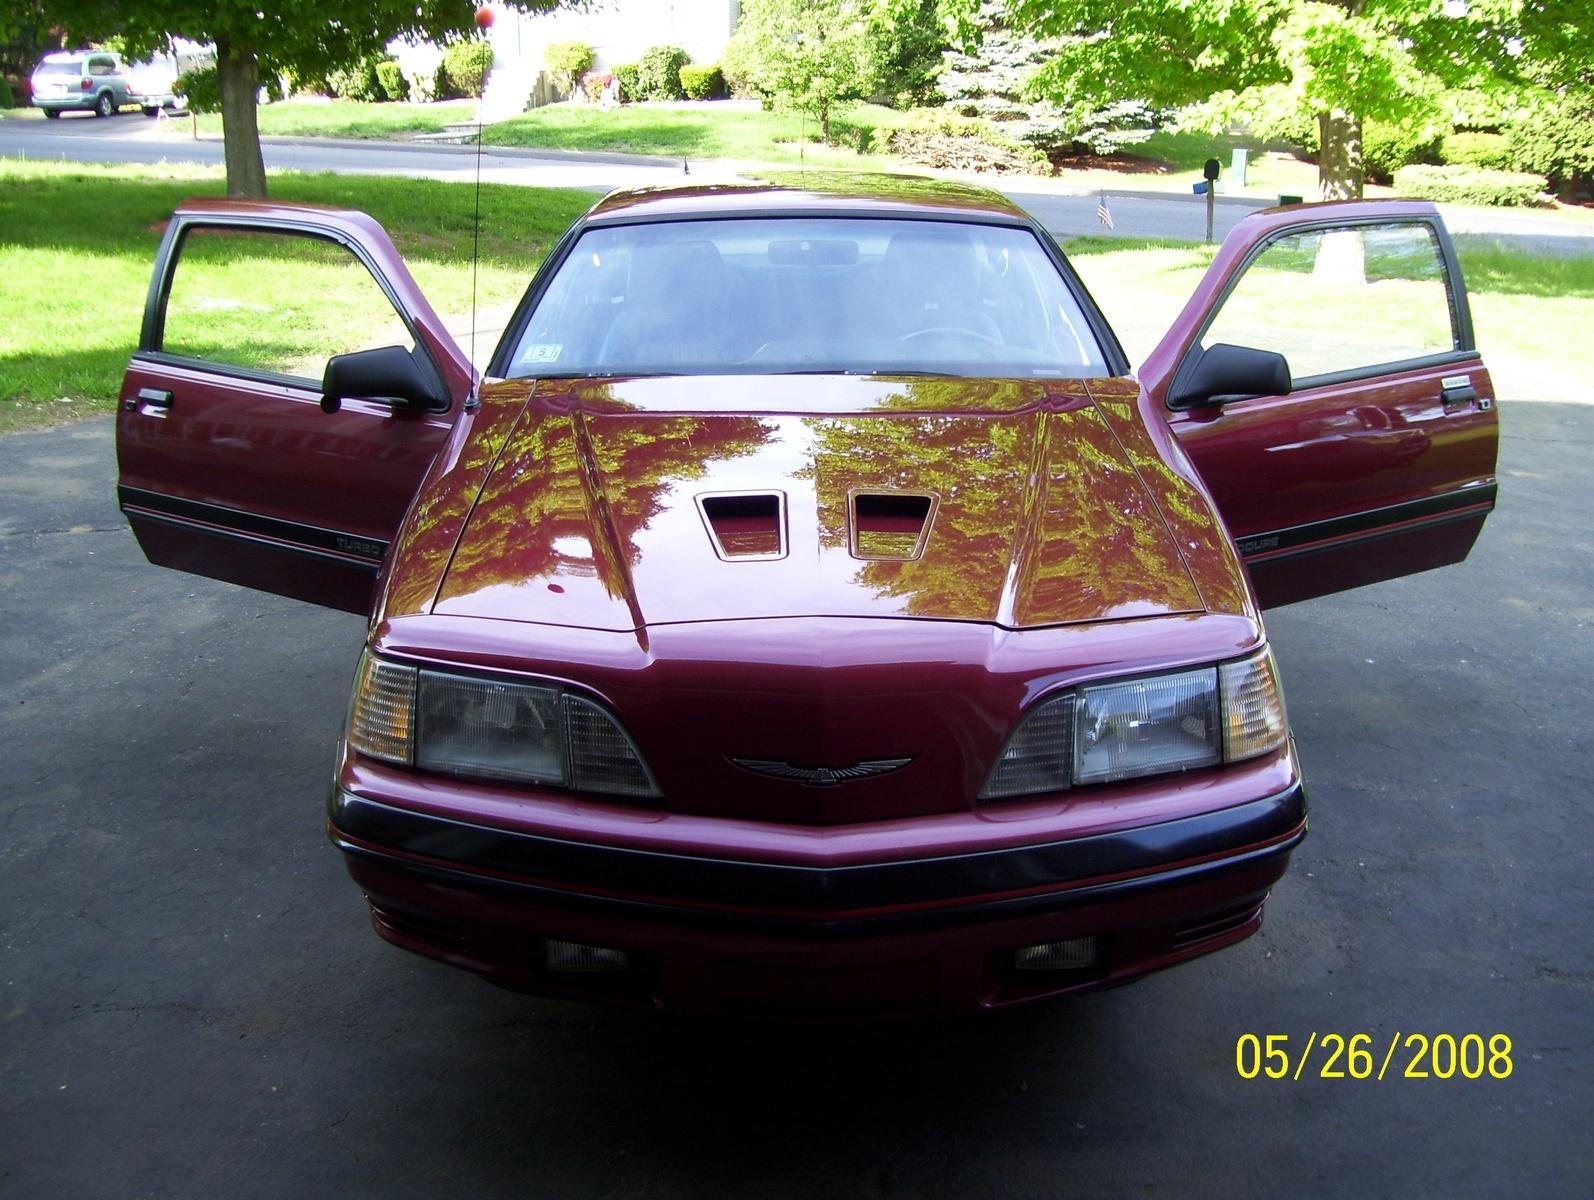 Ford Thunderbird Questions  1987 TBird Turbo Coupe  CarGurus